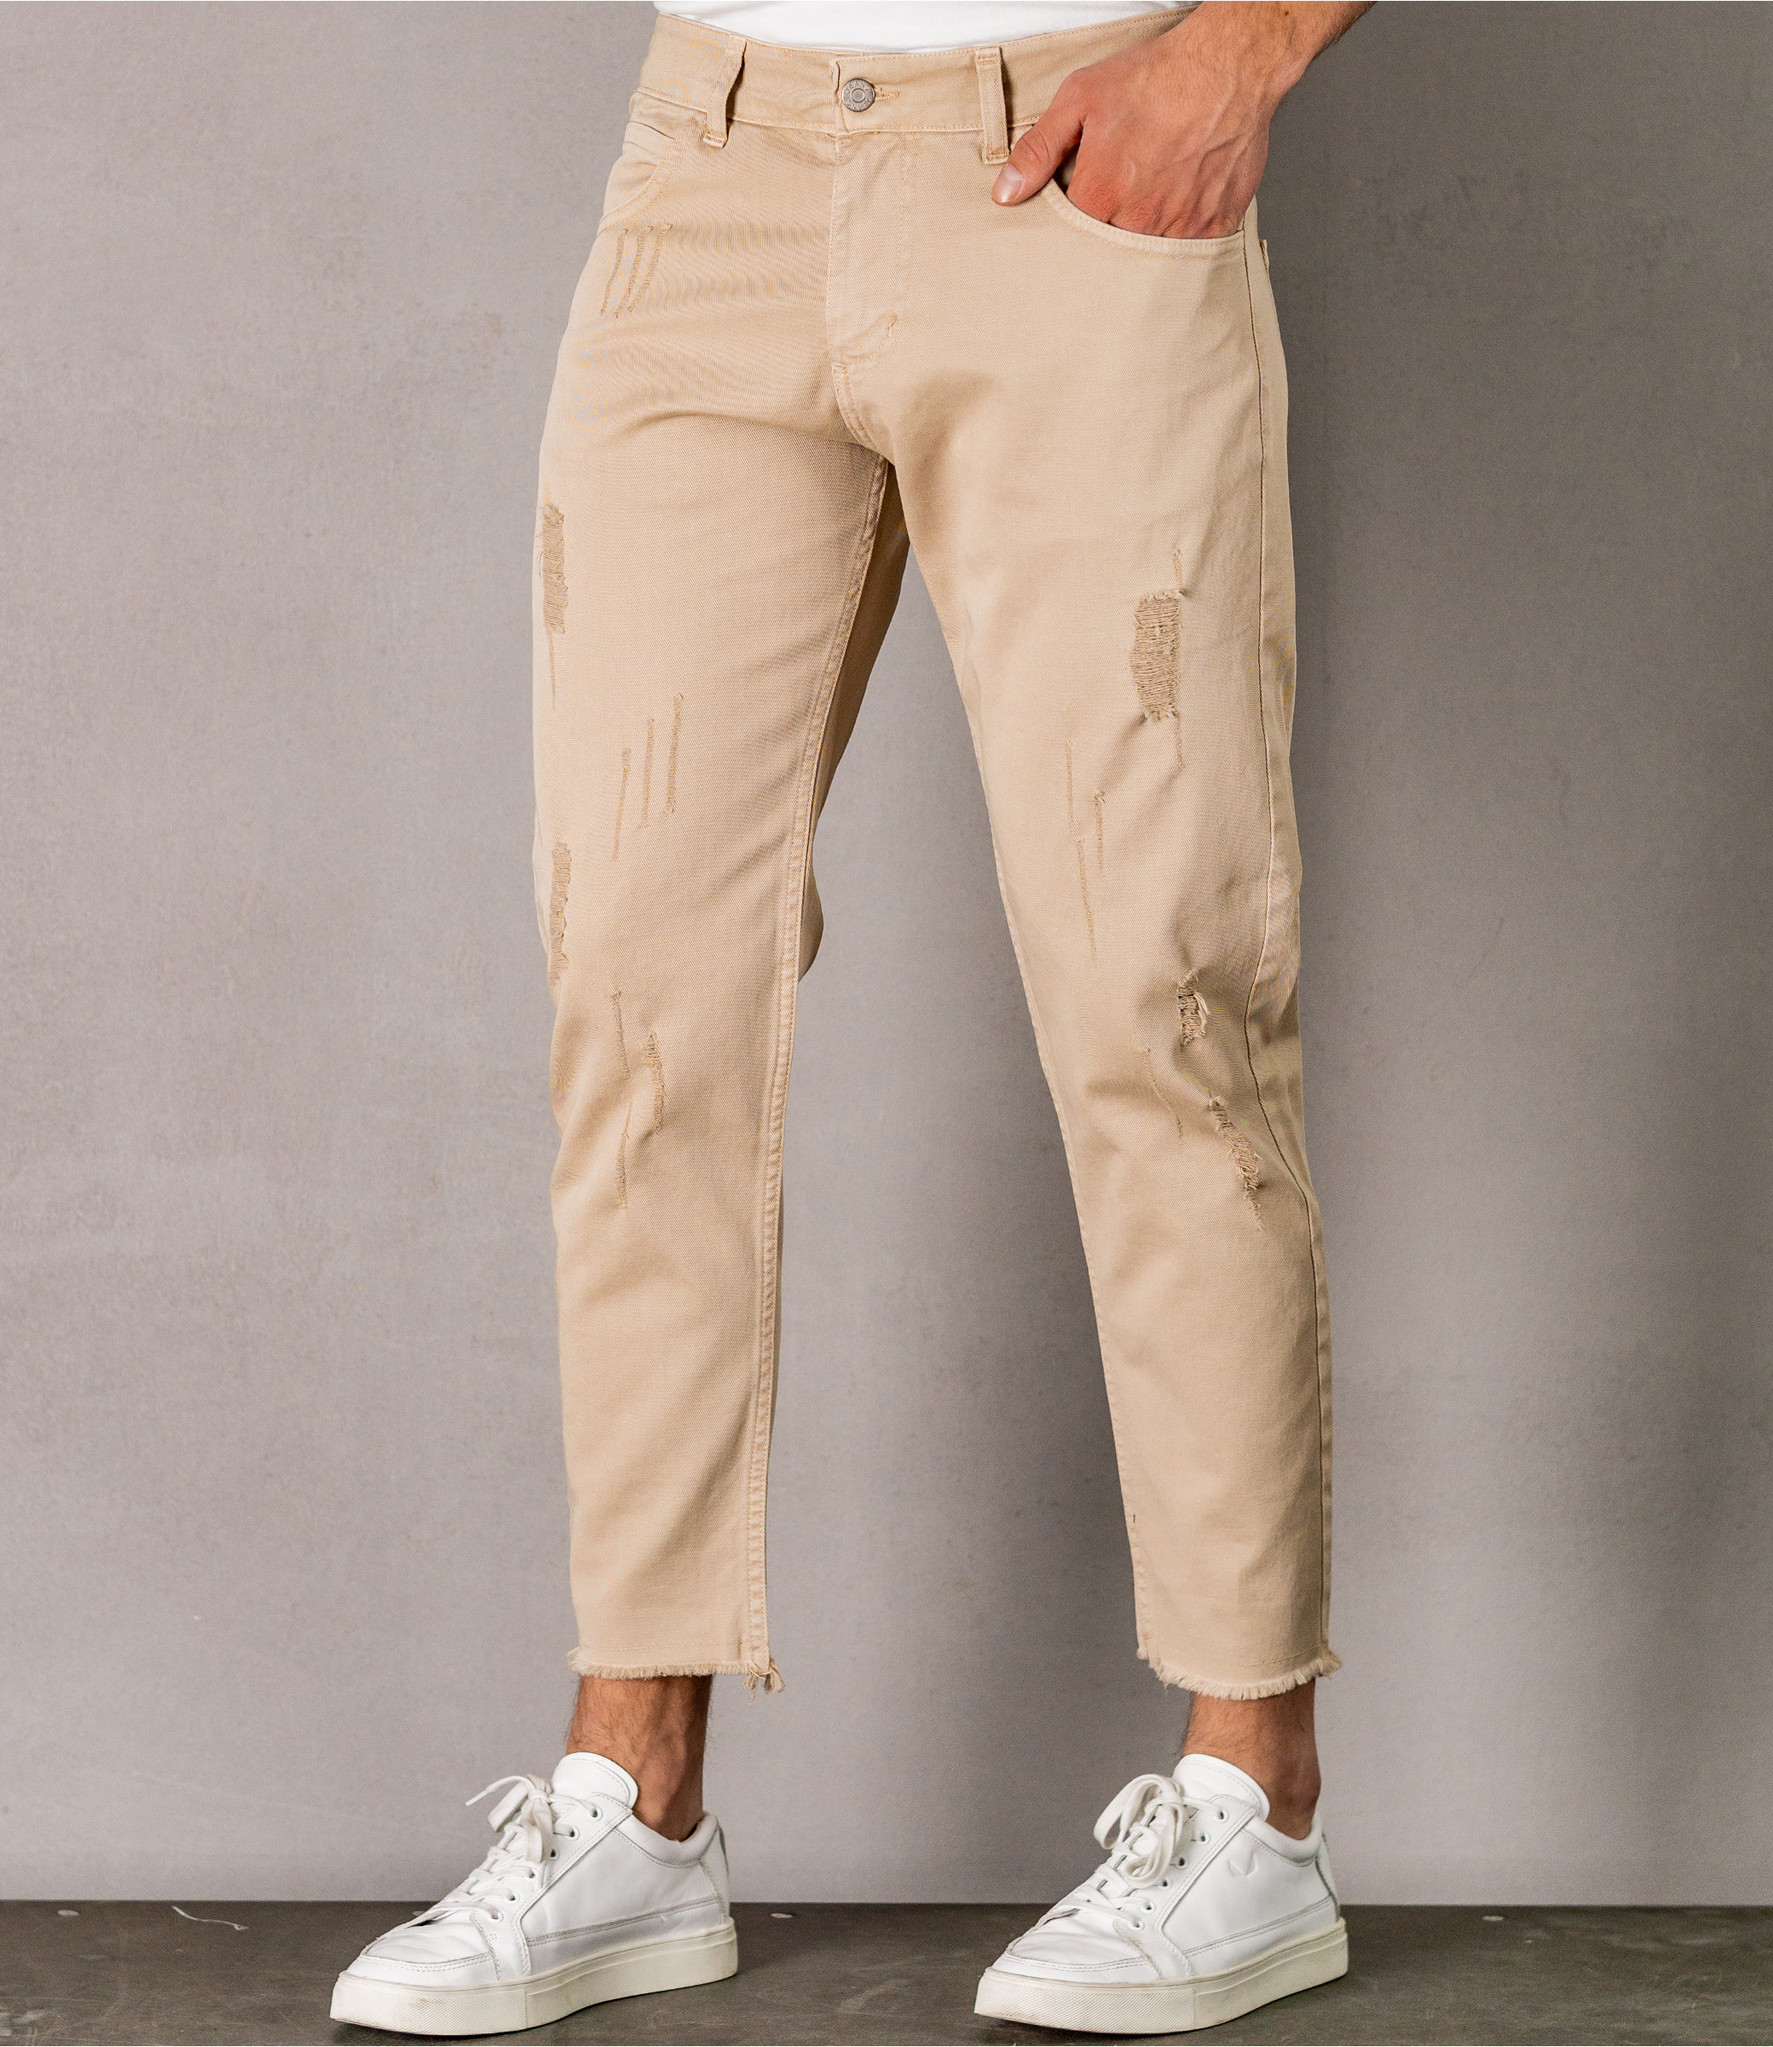 Zumo Slim Fit Jeans NICOLO Camel